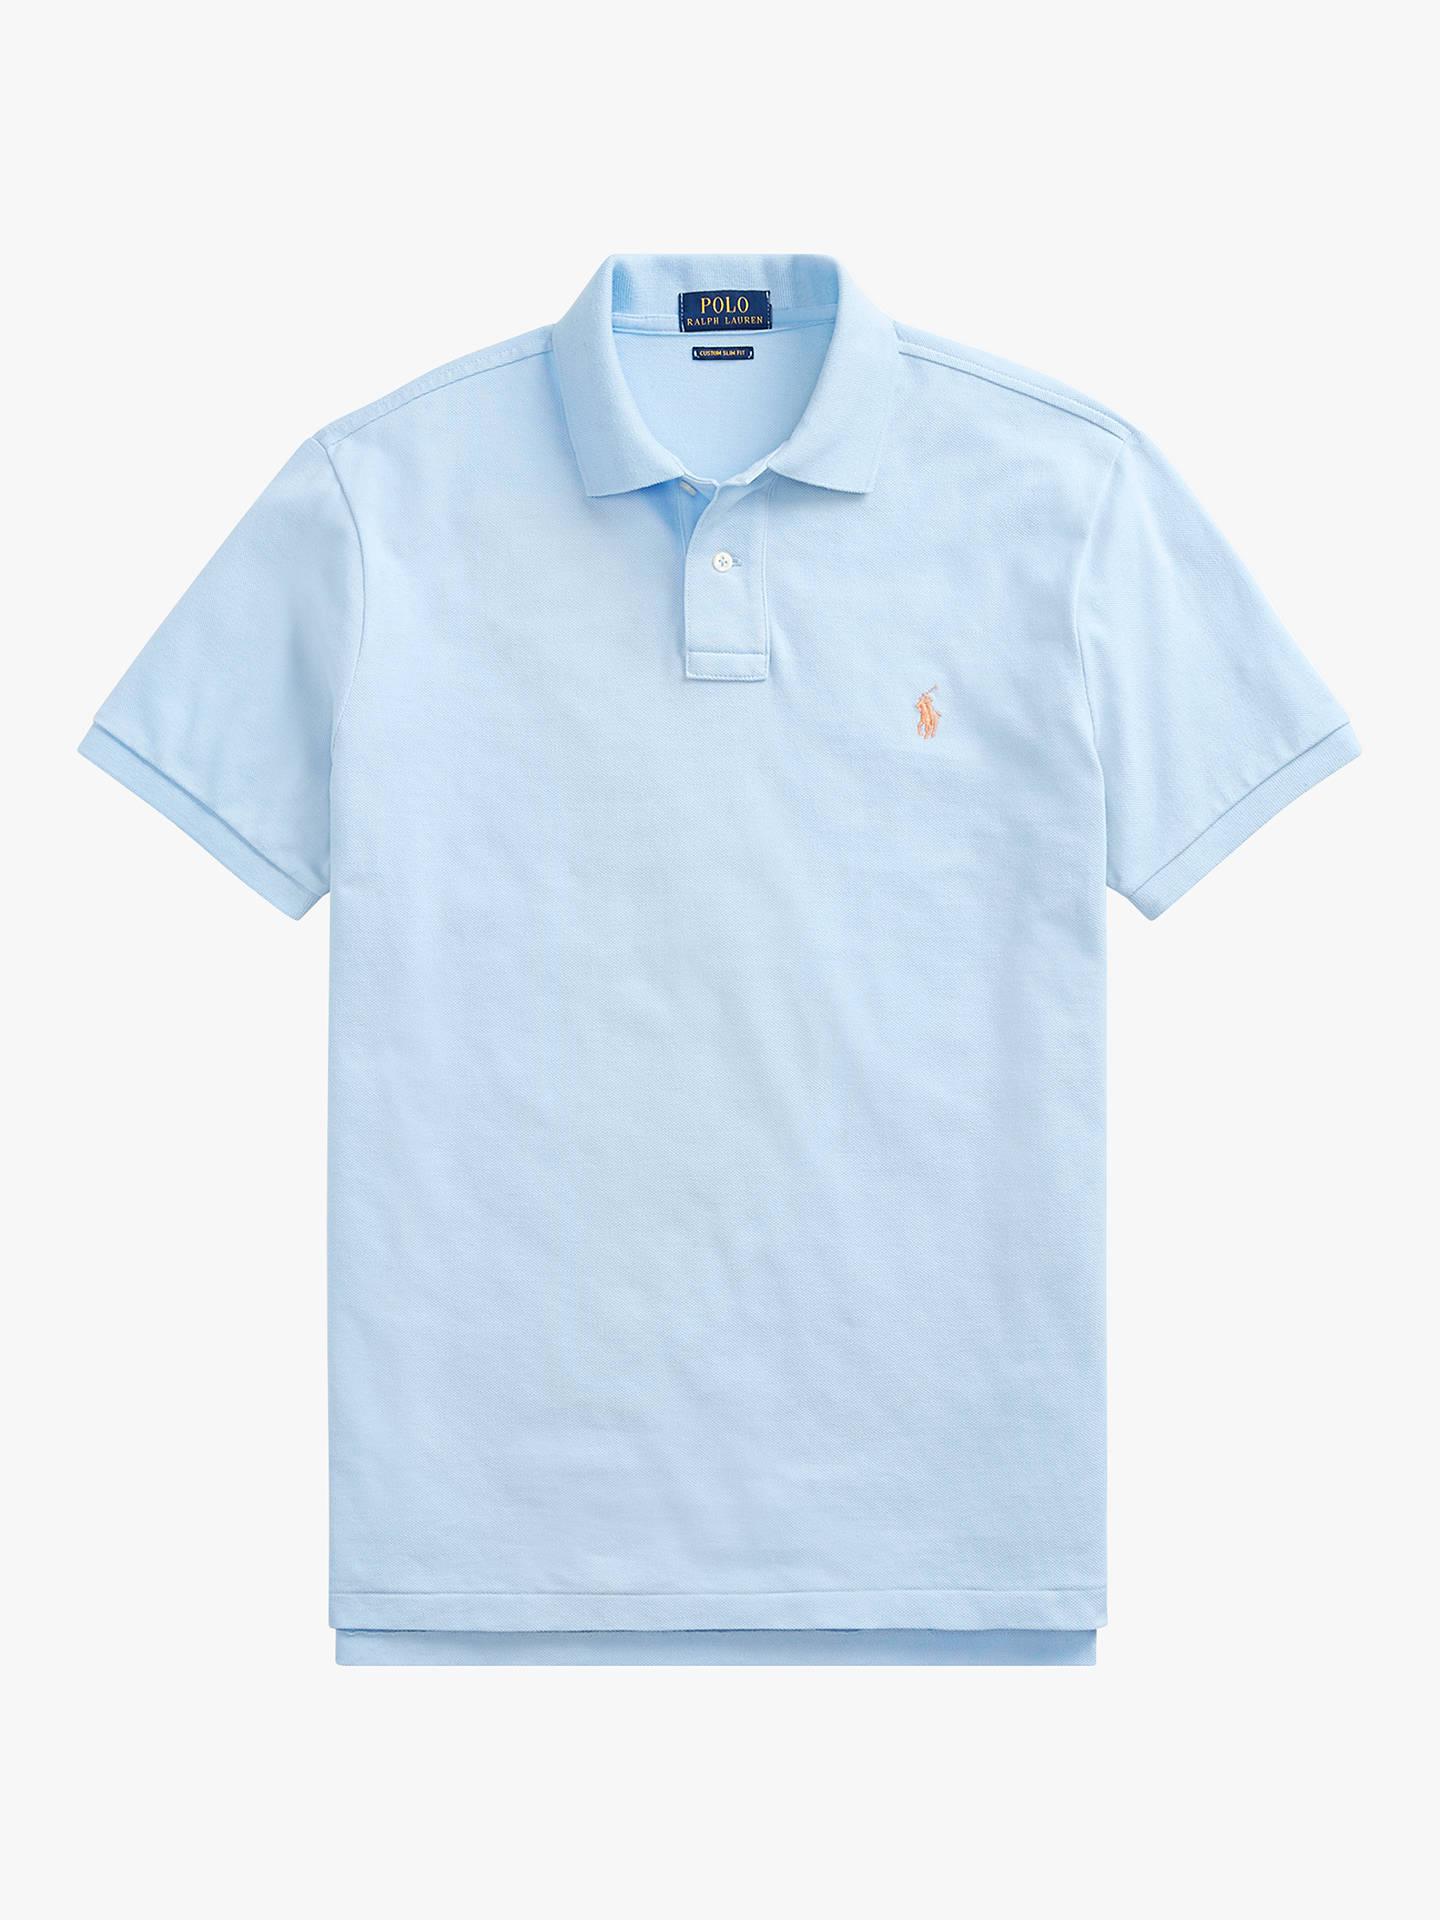 57238c7f4a5 Polo Ralph Lauren Slim Fit Mesh Polo Shirt at John Lewis   Partners